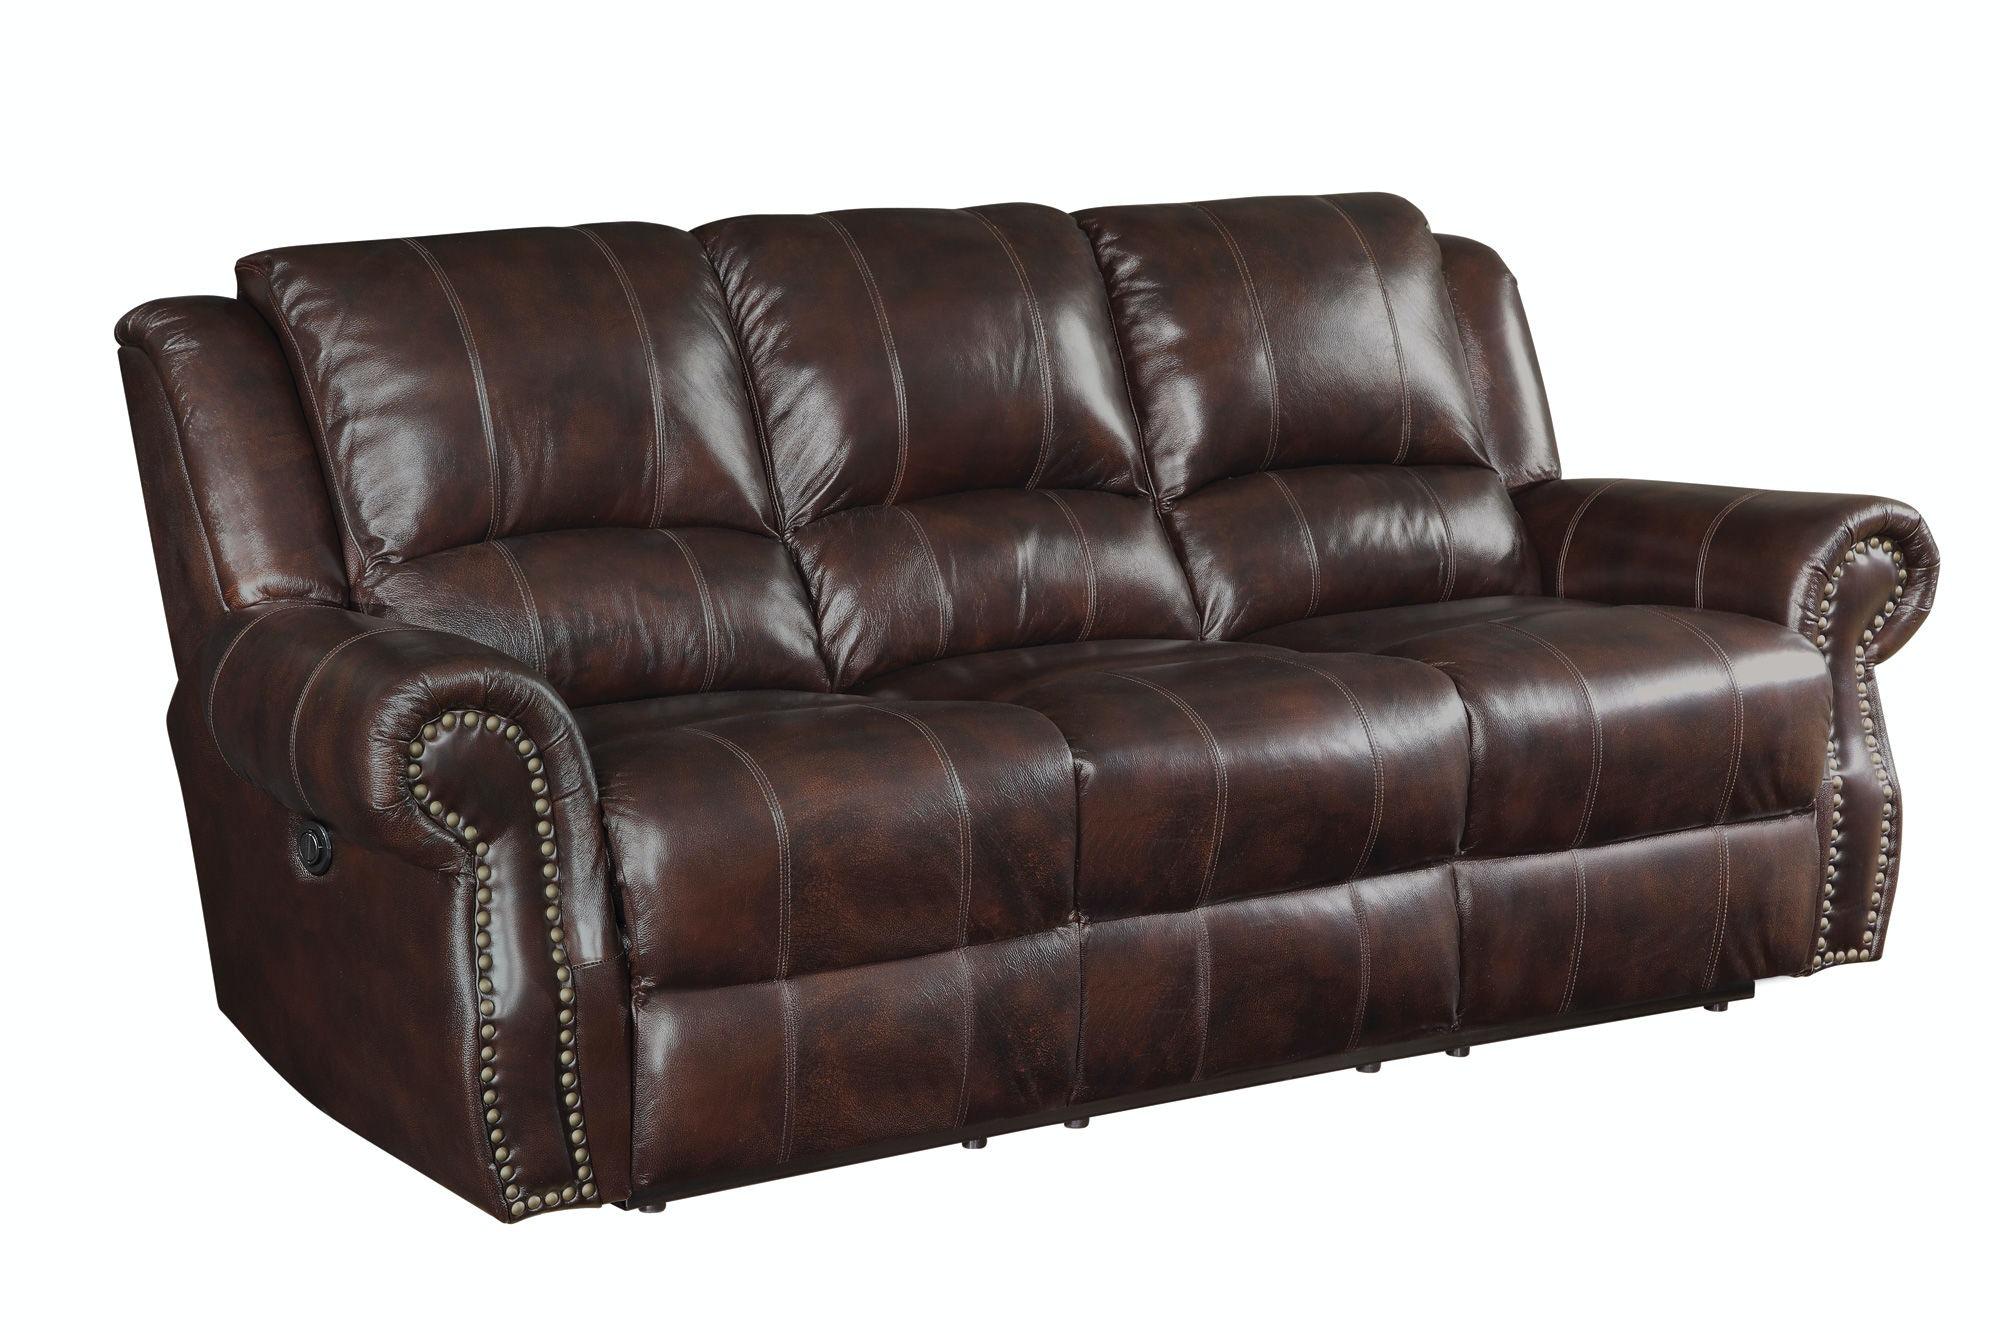 ron fiore century furniture. plain fiore furniture coaster motion sofa 650161 with concept design ron century